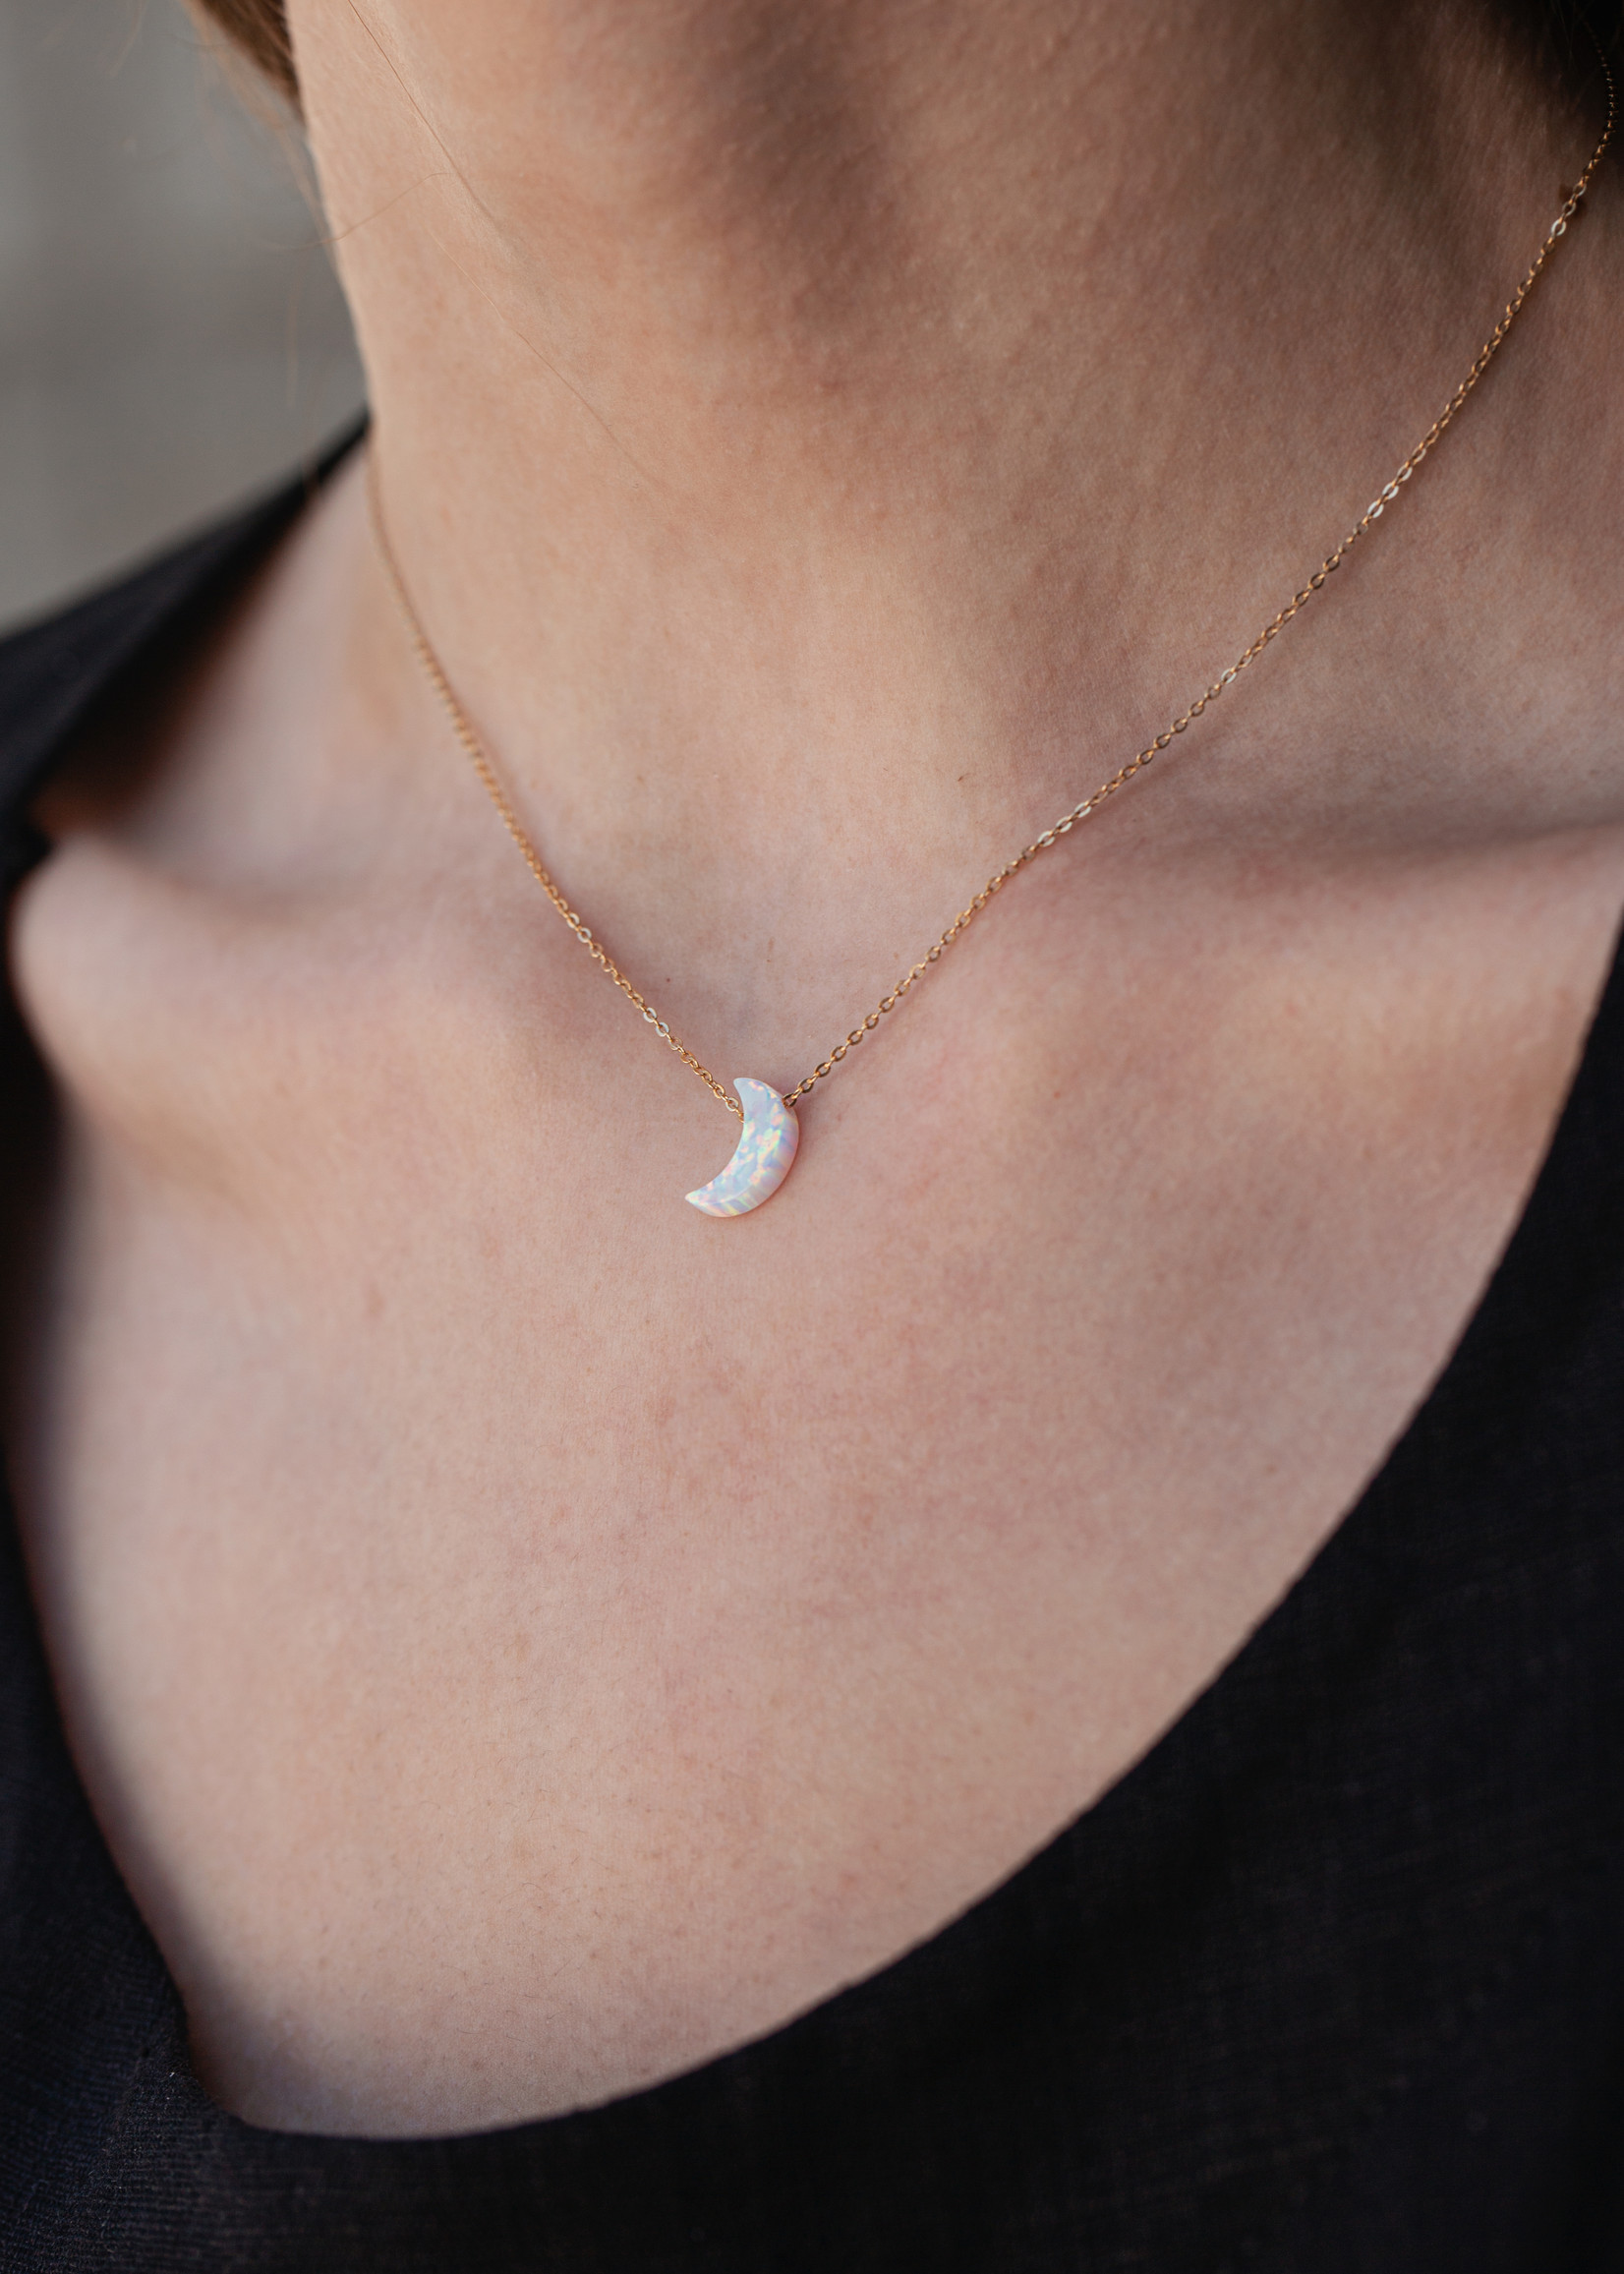 May Martin May Martin - Moon Opalite Necklace